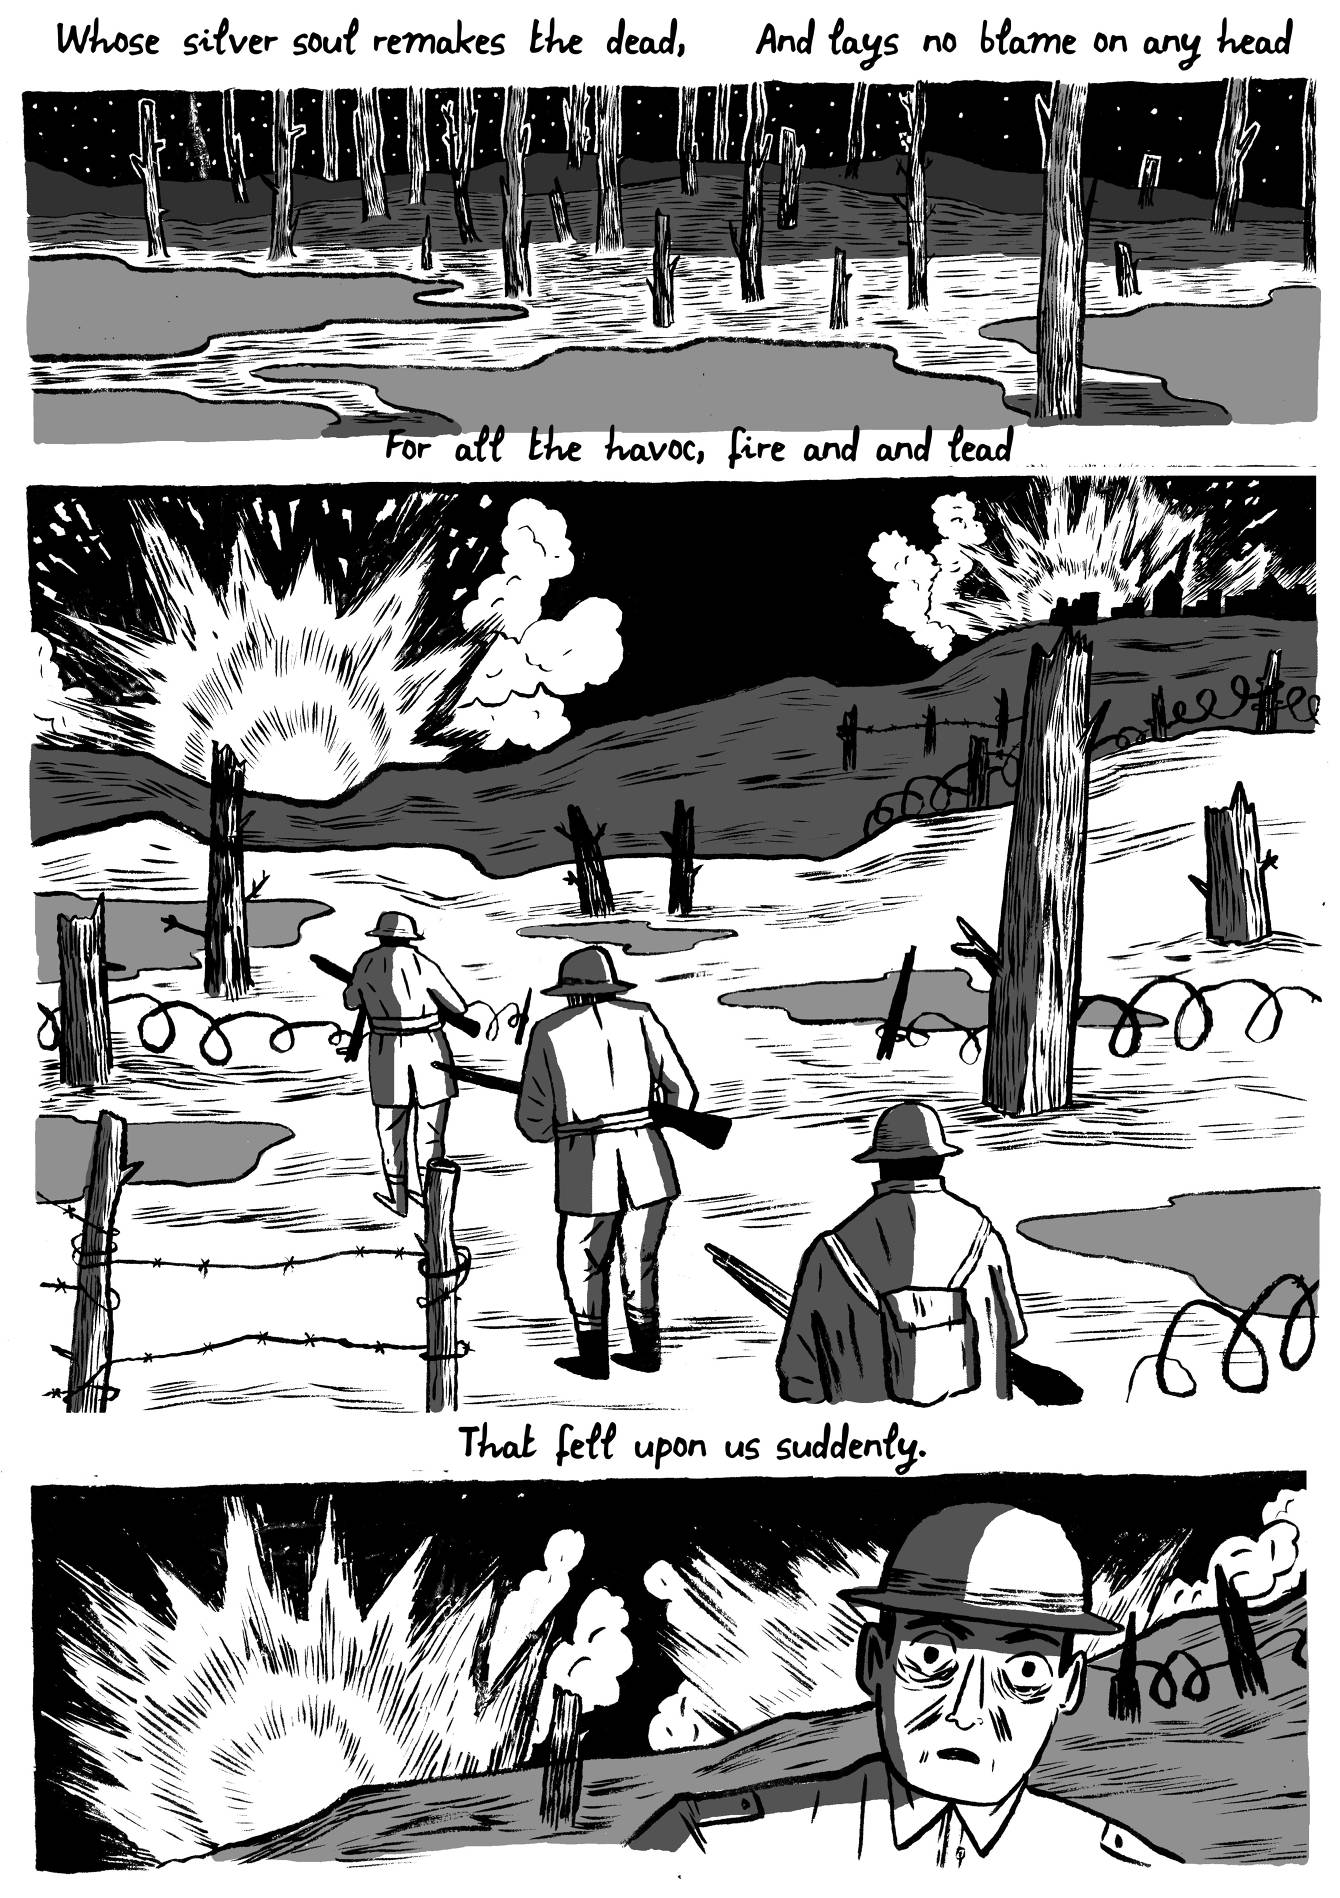 Page5_2x.jpg